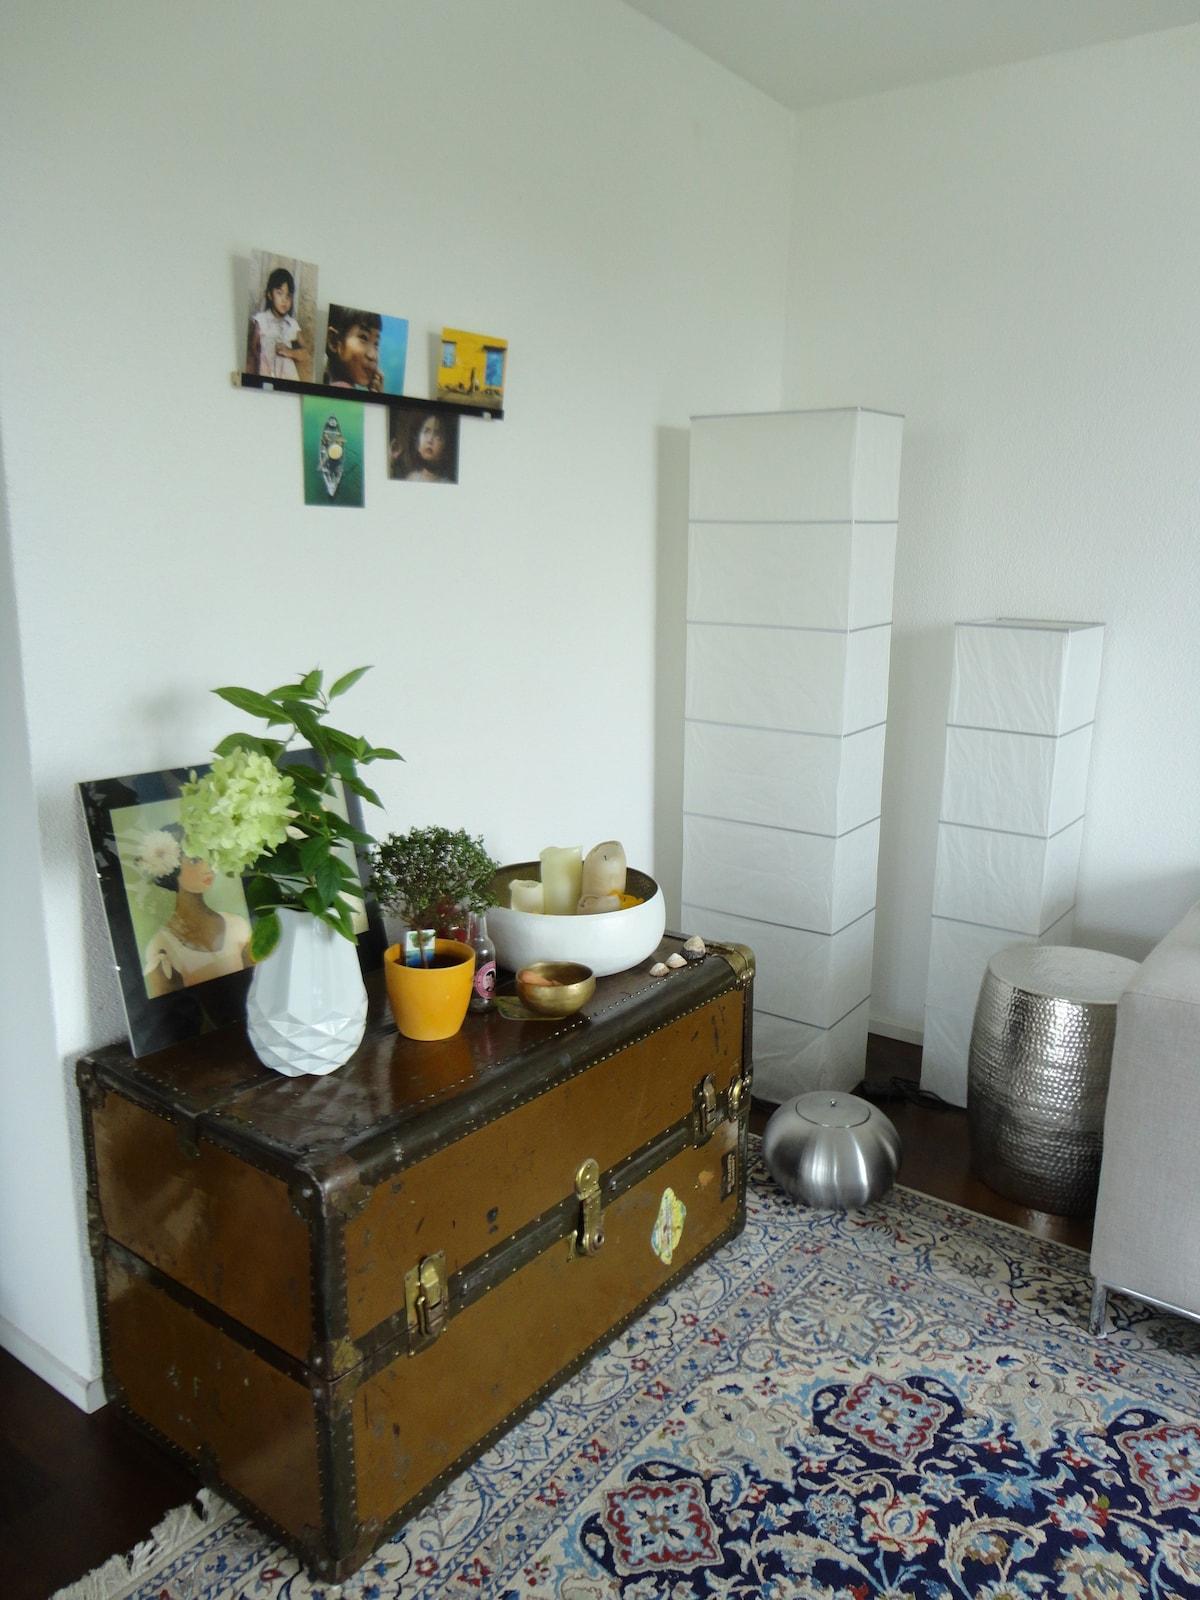 Kreuzlingen 2017: Top 20 Ferienwohnungen In Kreuzlingen, Ferienhäuser,  Unterkünfte U0026 Apartments U2013 Airbnb Kreuzlingen, Thurgau, Schweiz